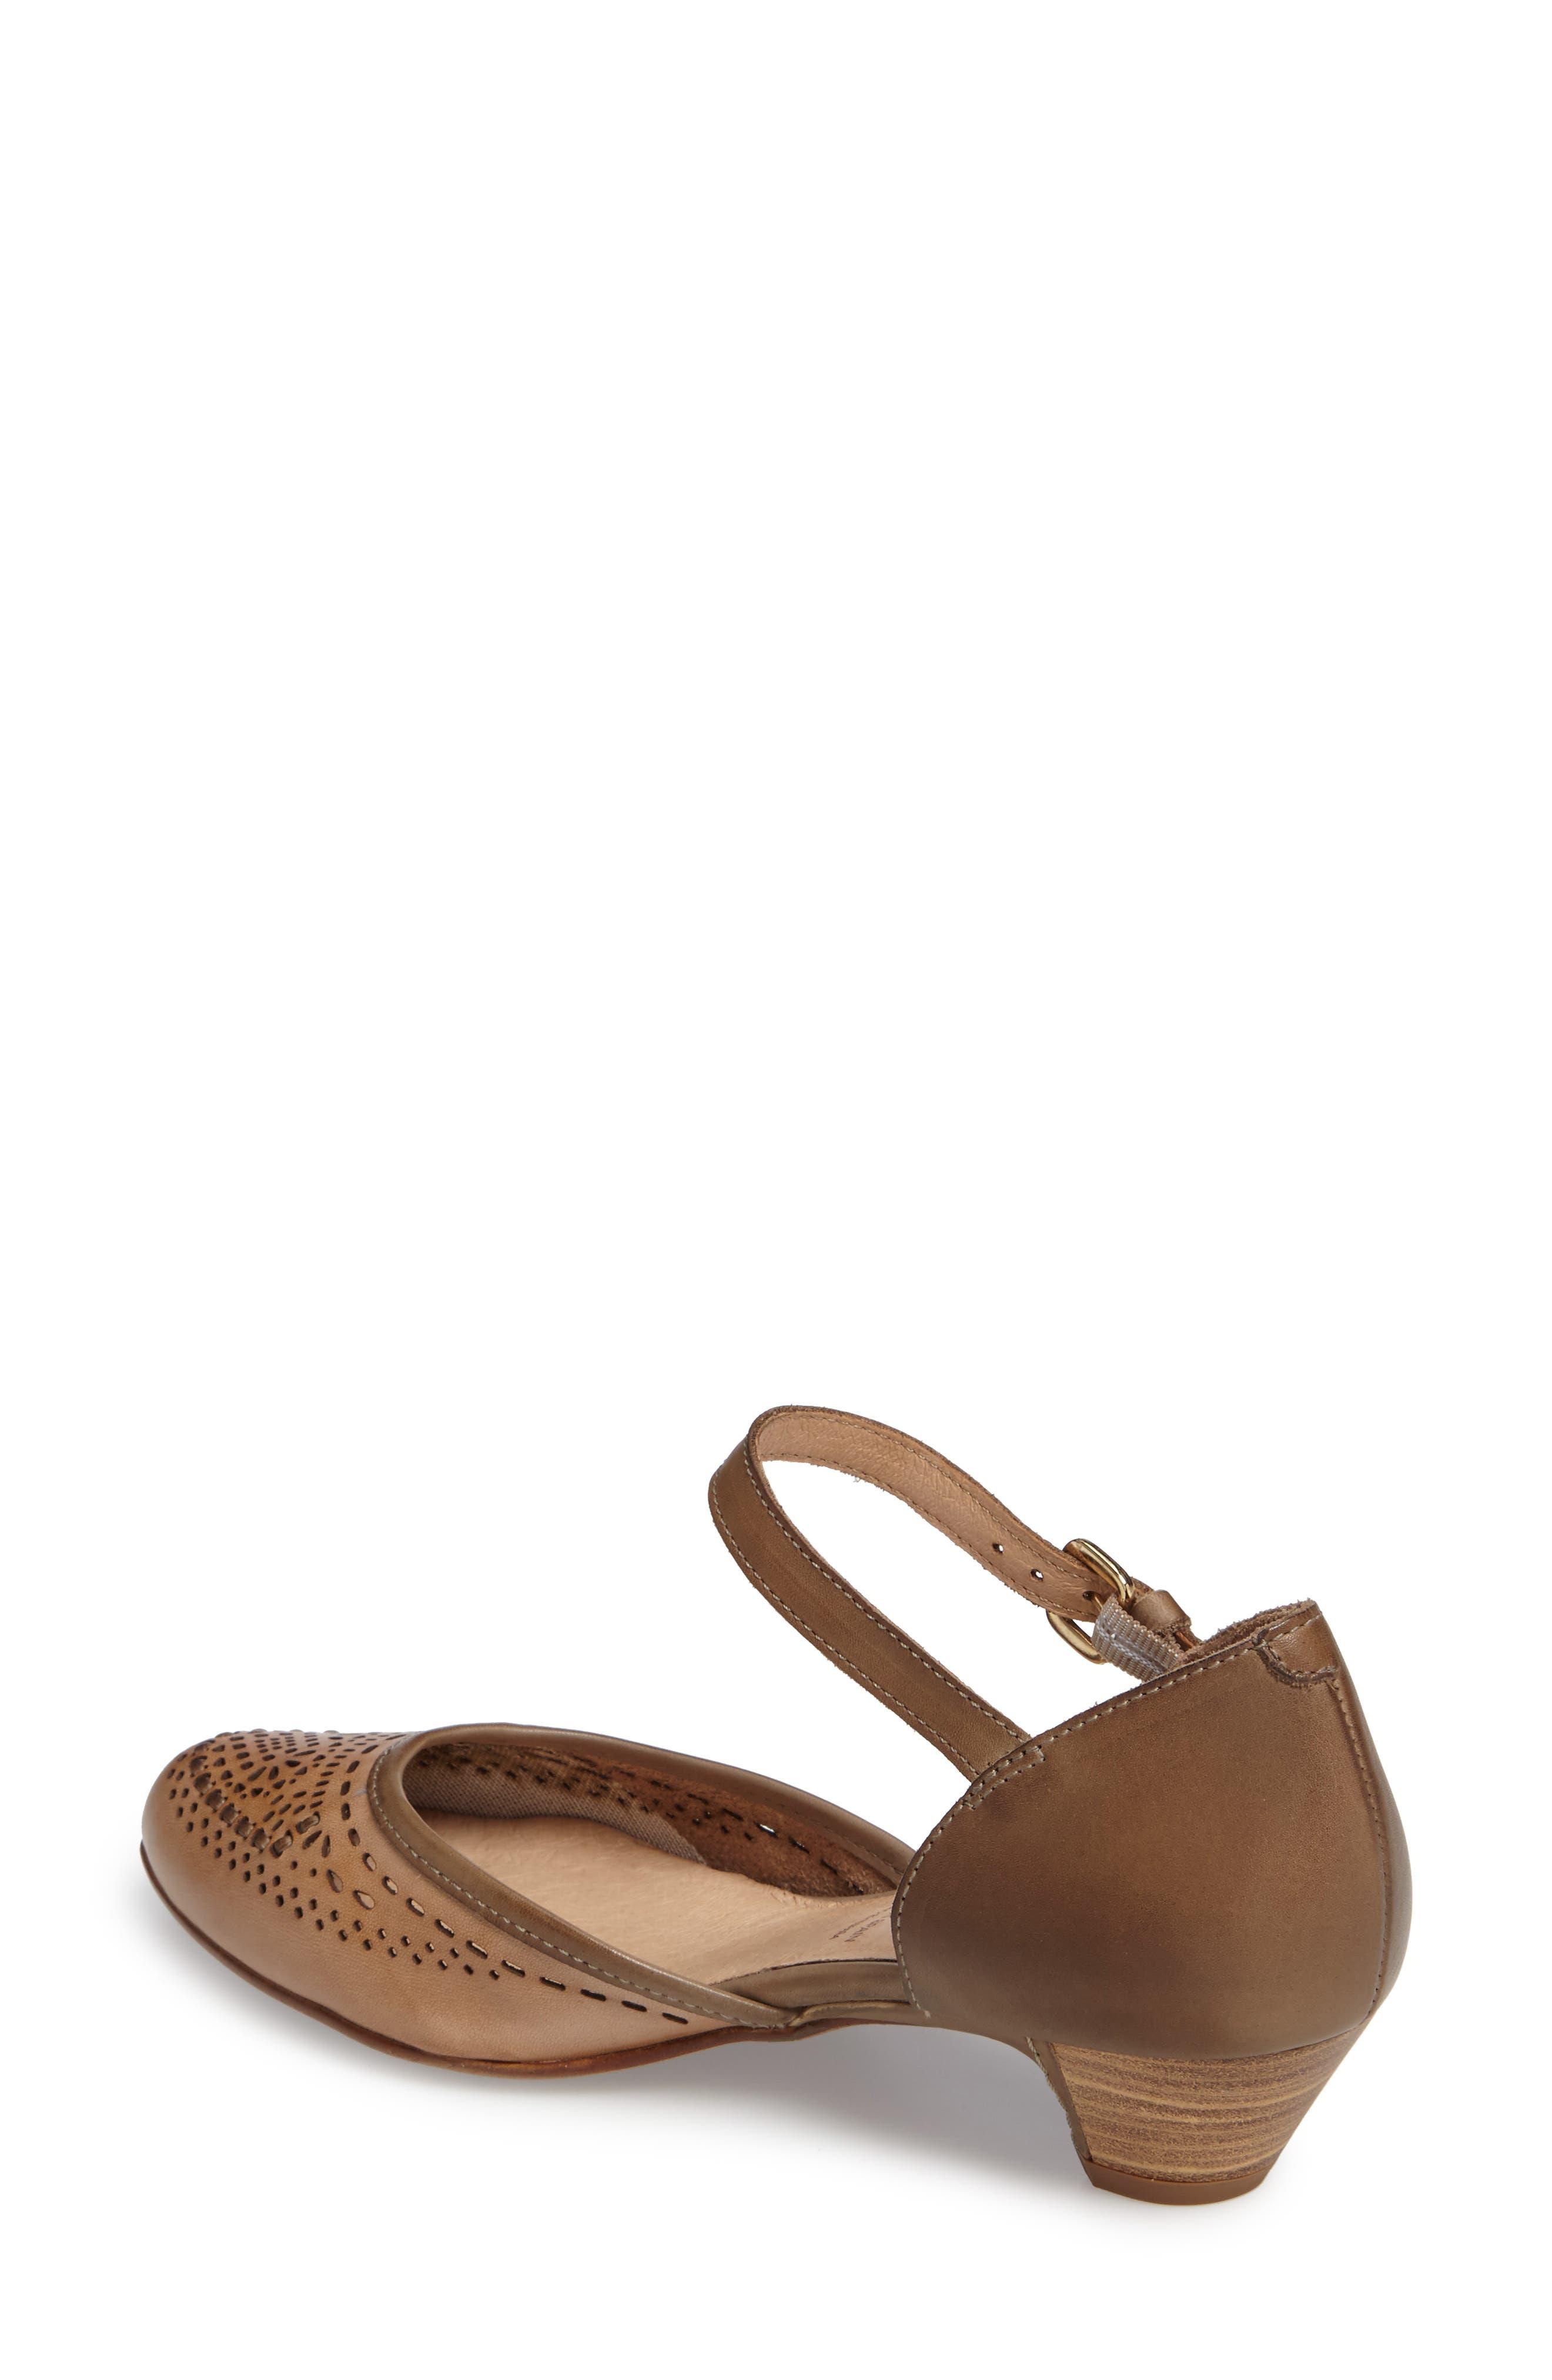 Alternate Image 2  - PIKOLINOS 'Elba' Perforated Leather Ankle Strap Sandal (Women)